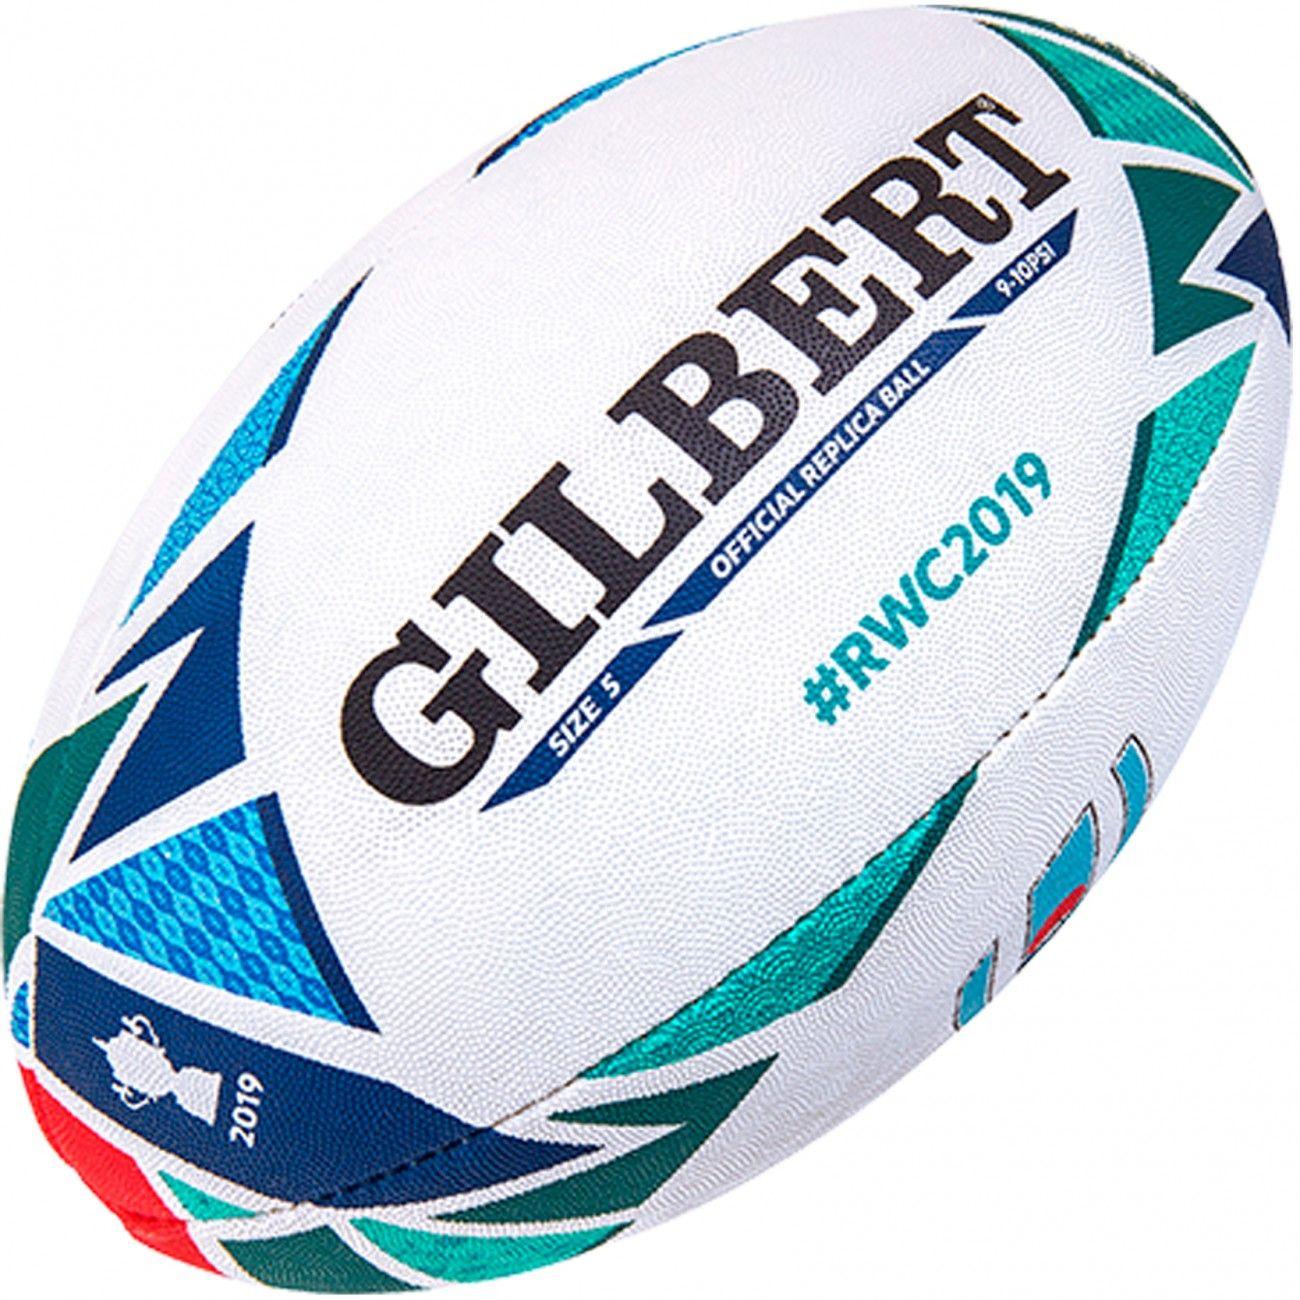 Gilbert Rugby World Cup 2019 Replica Ball